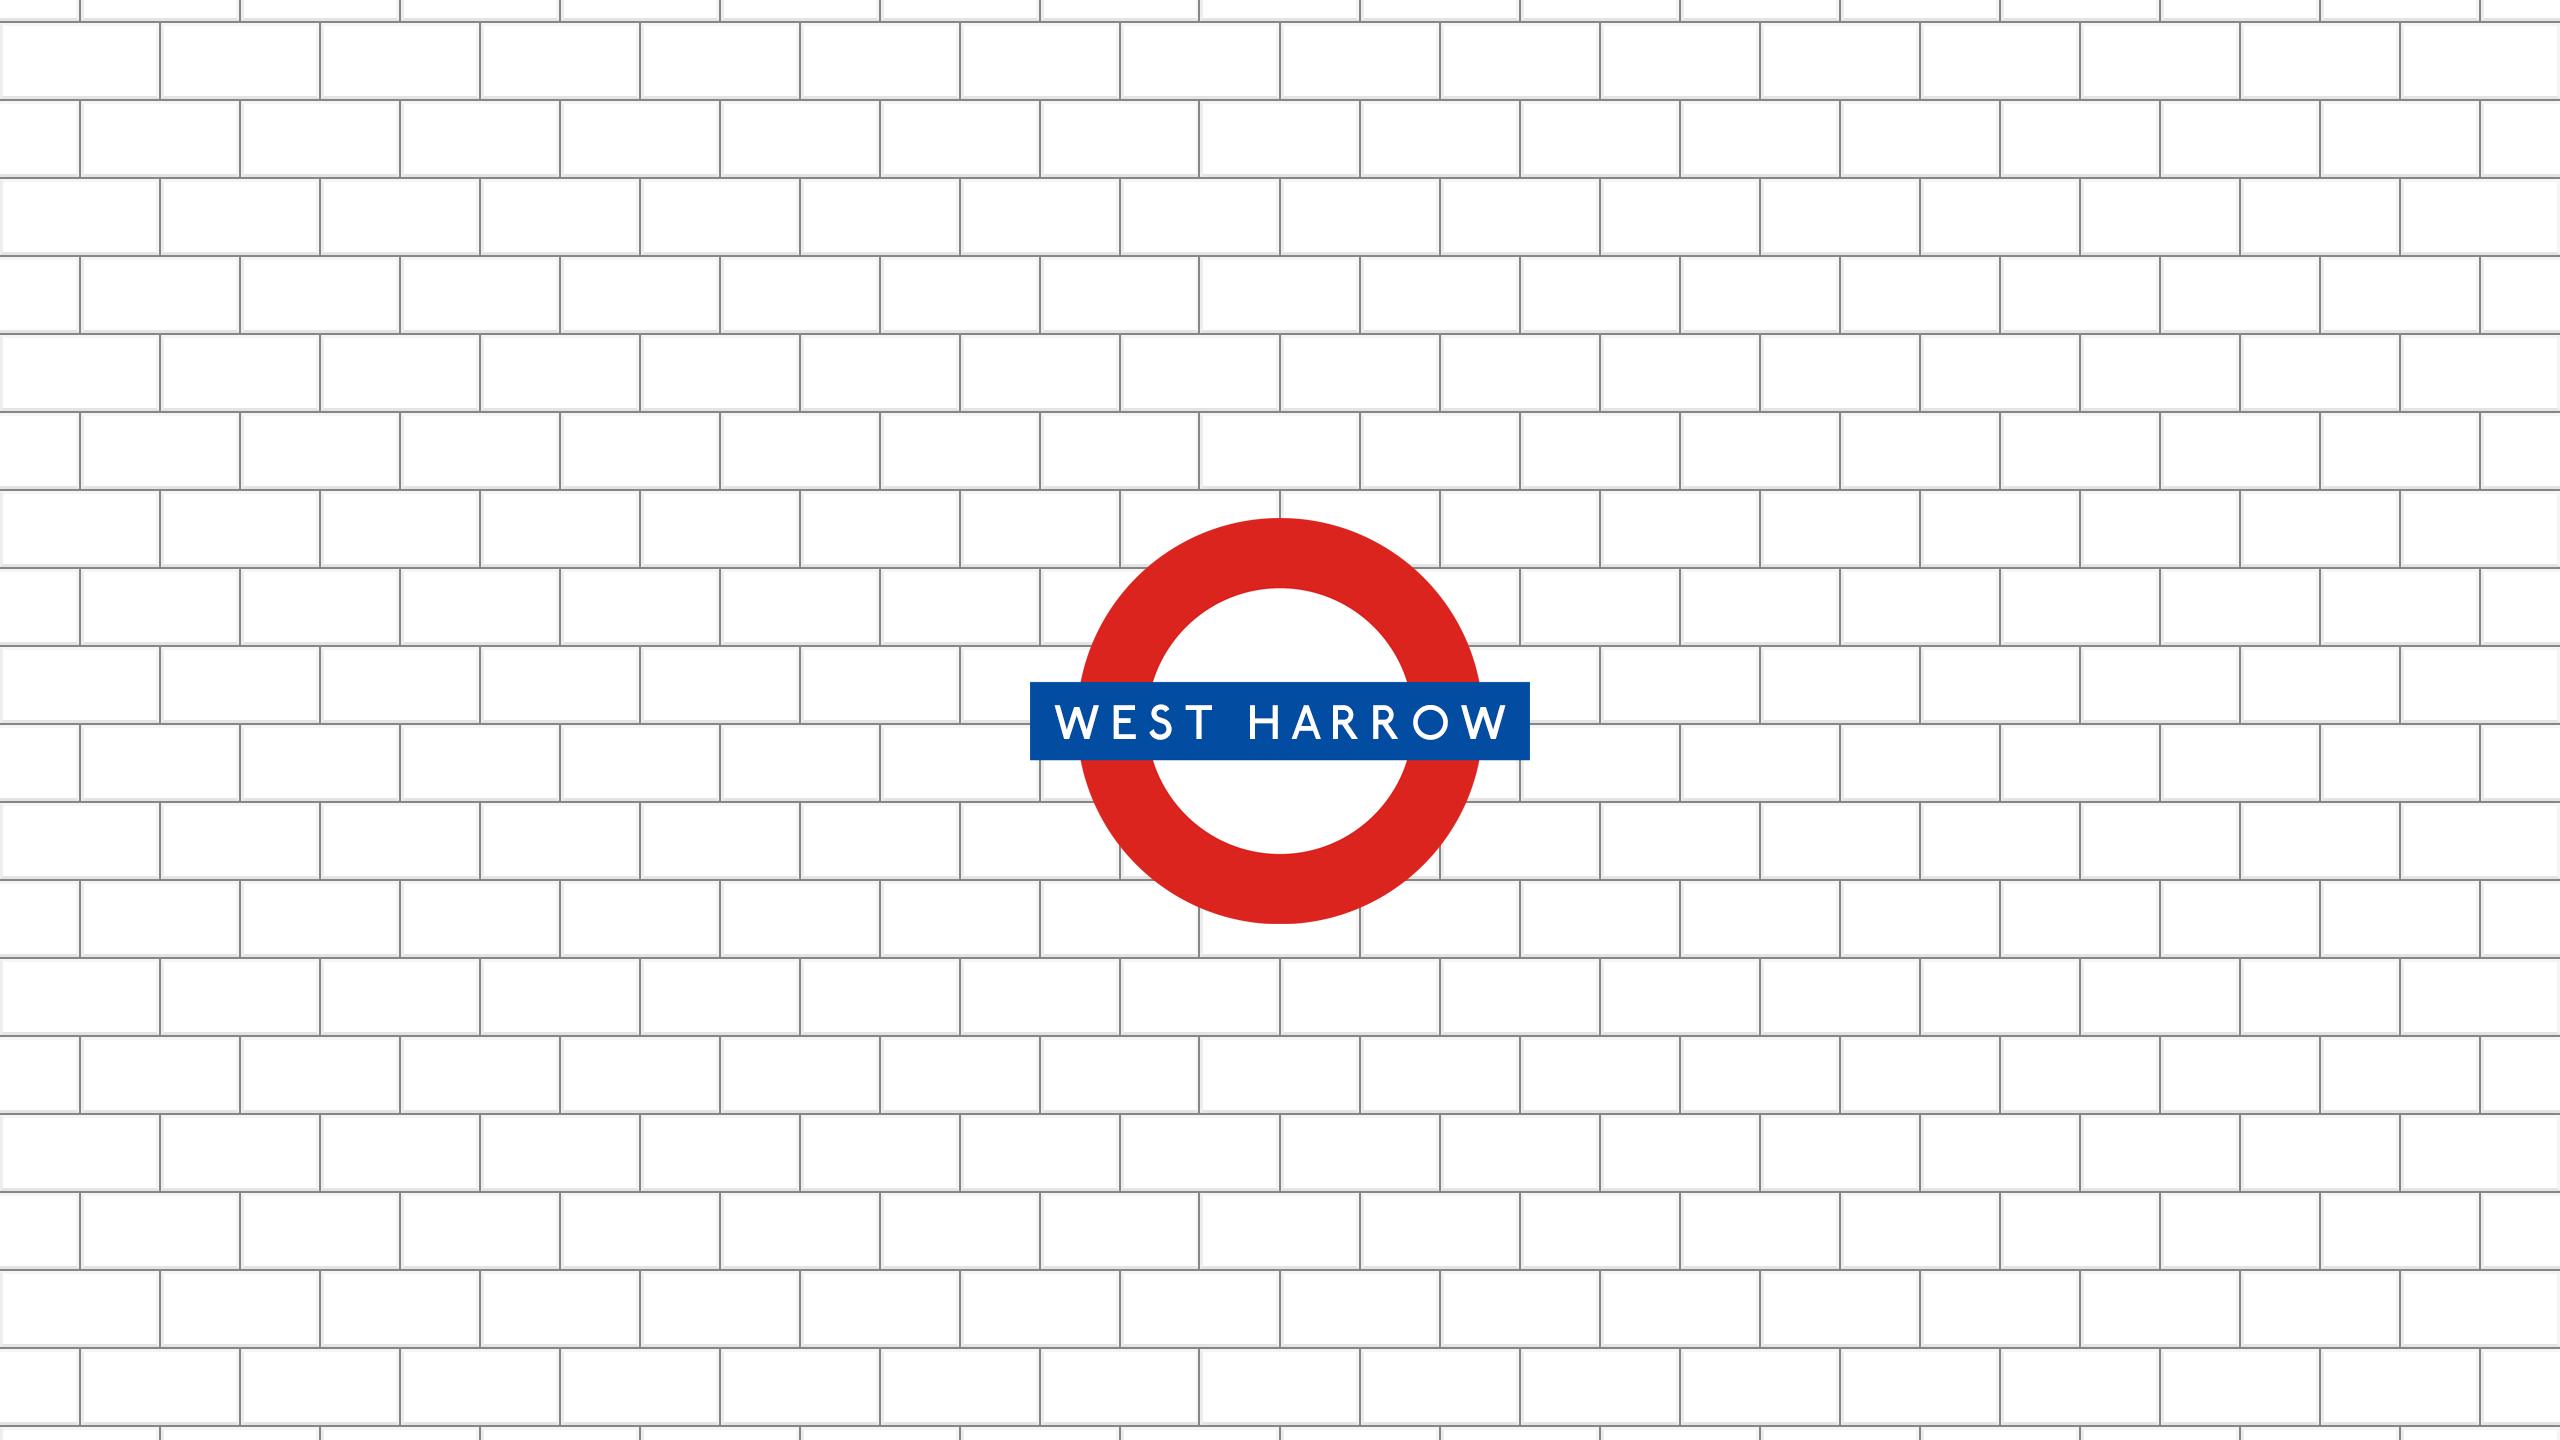 West Harrow